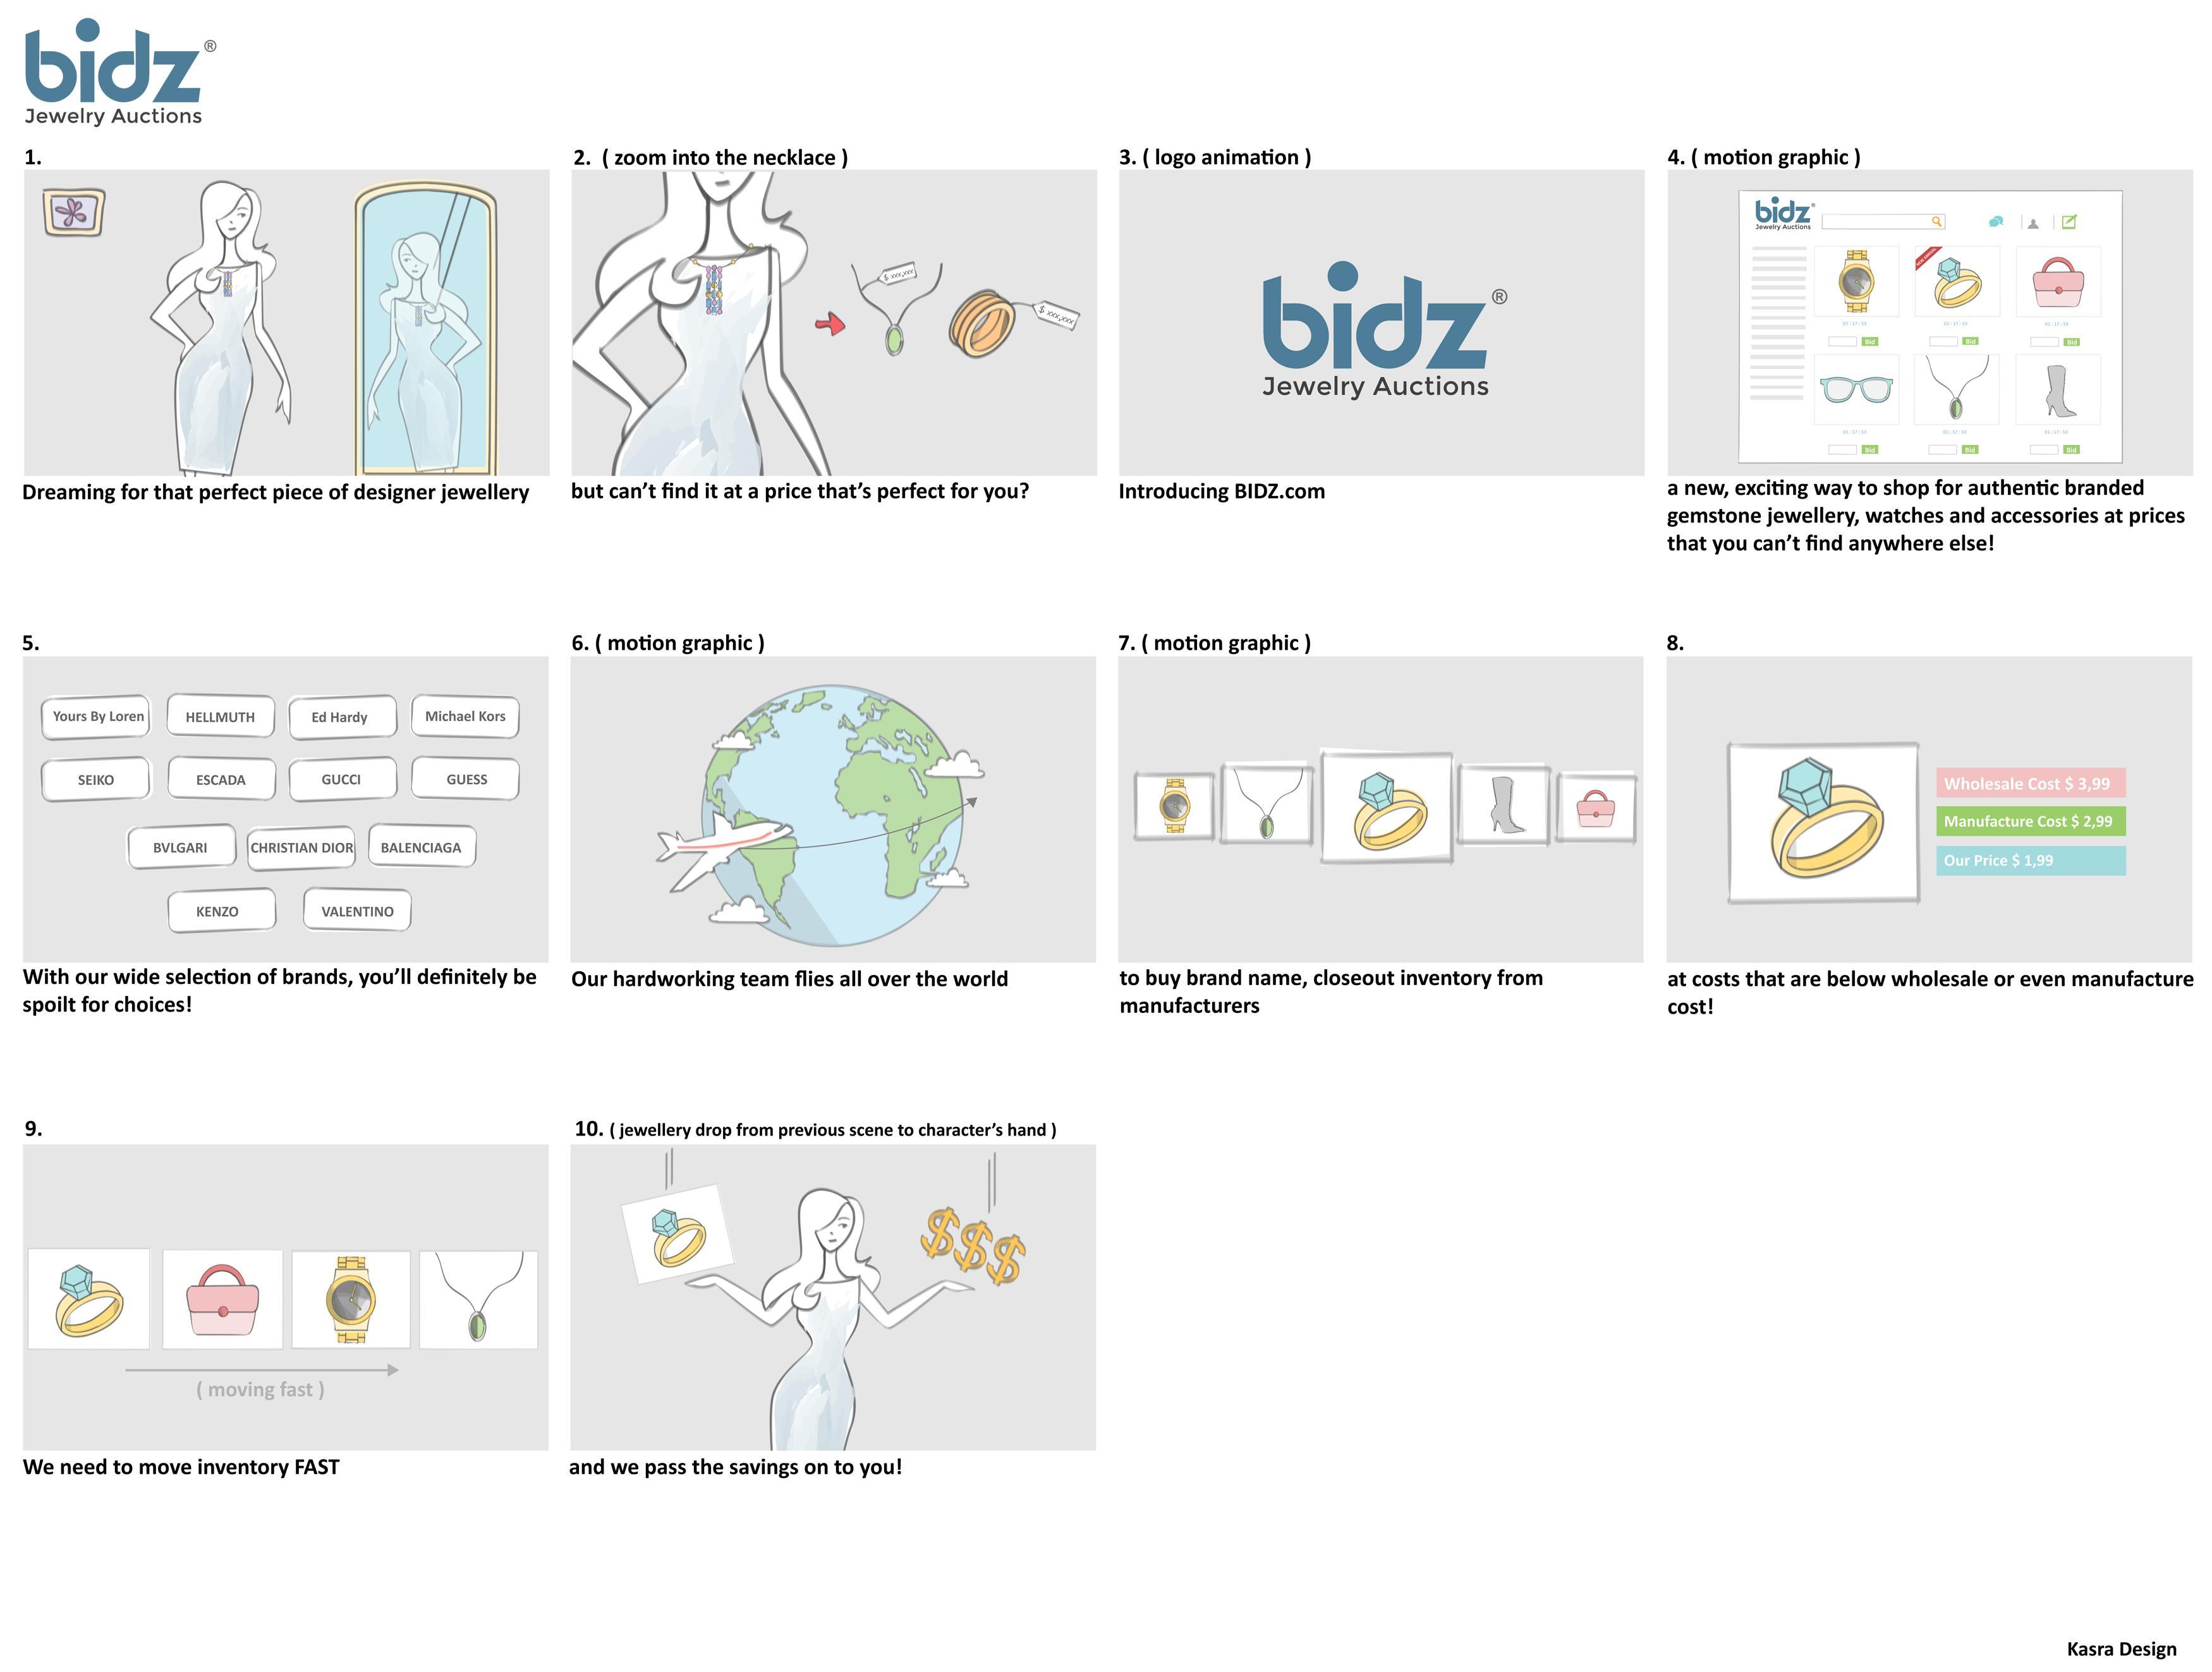 bidz-project-storyboard